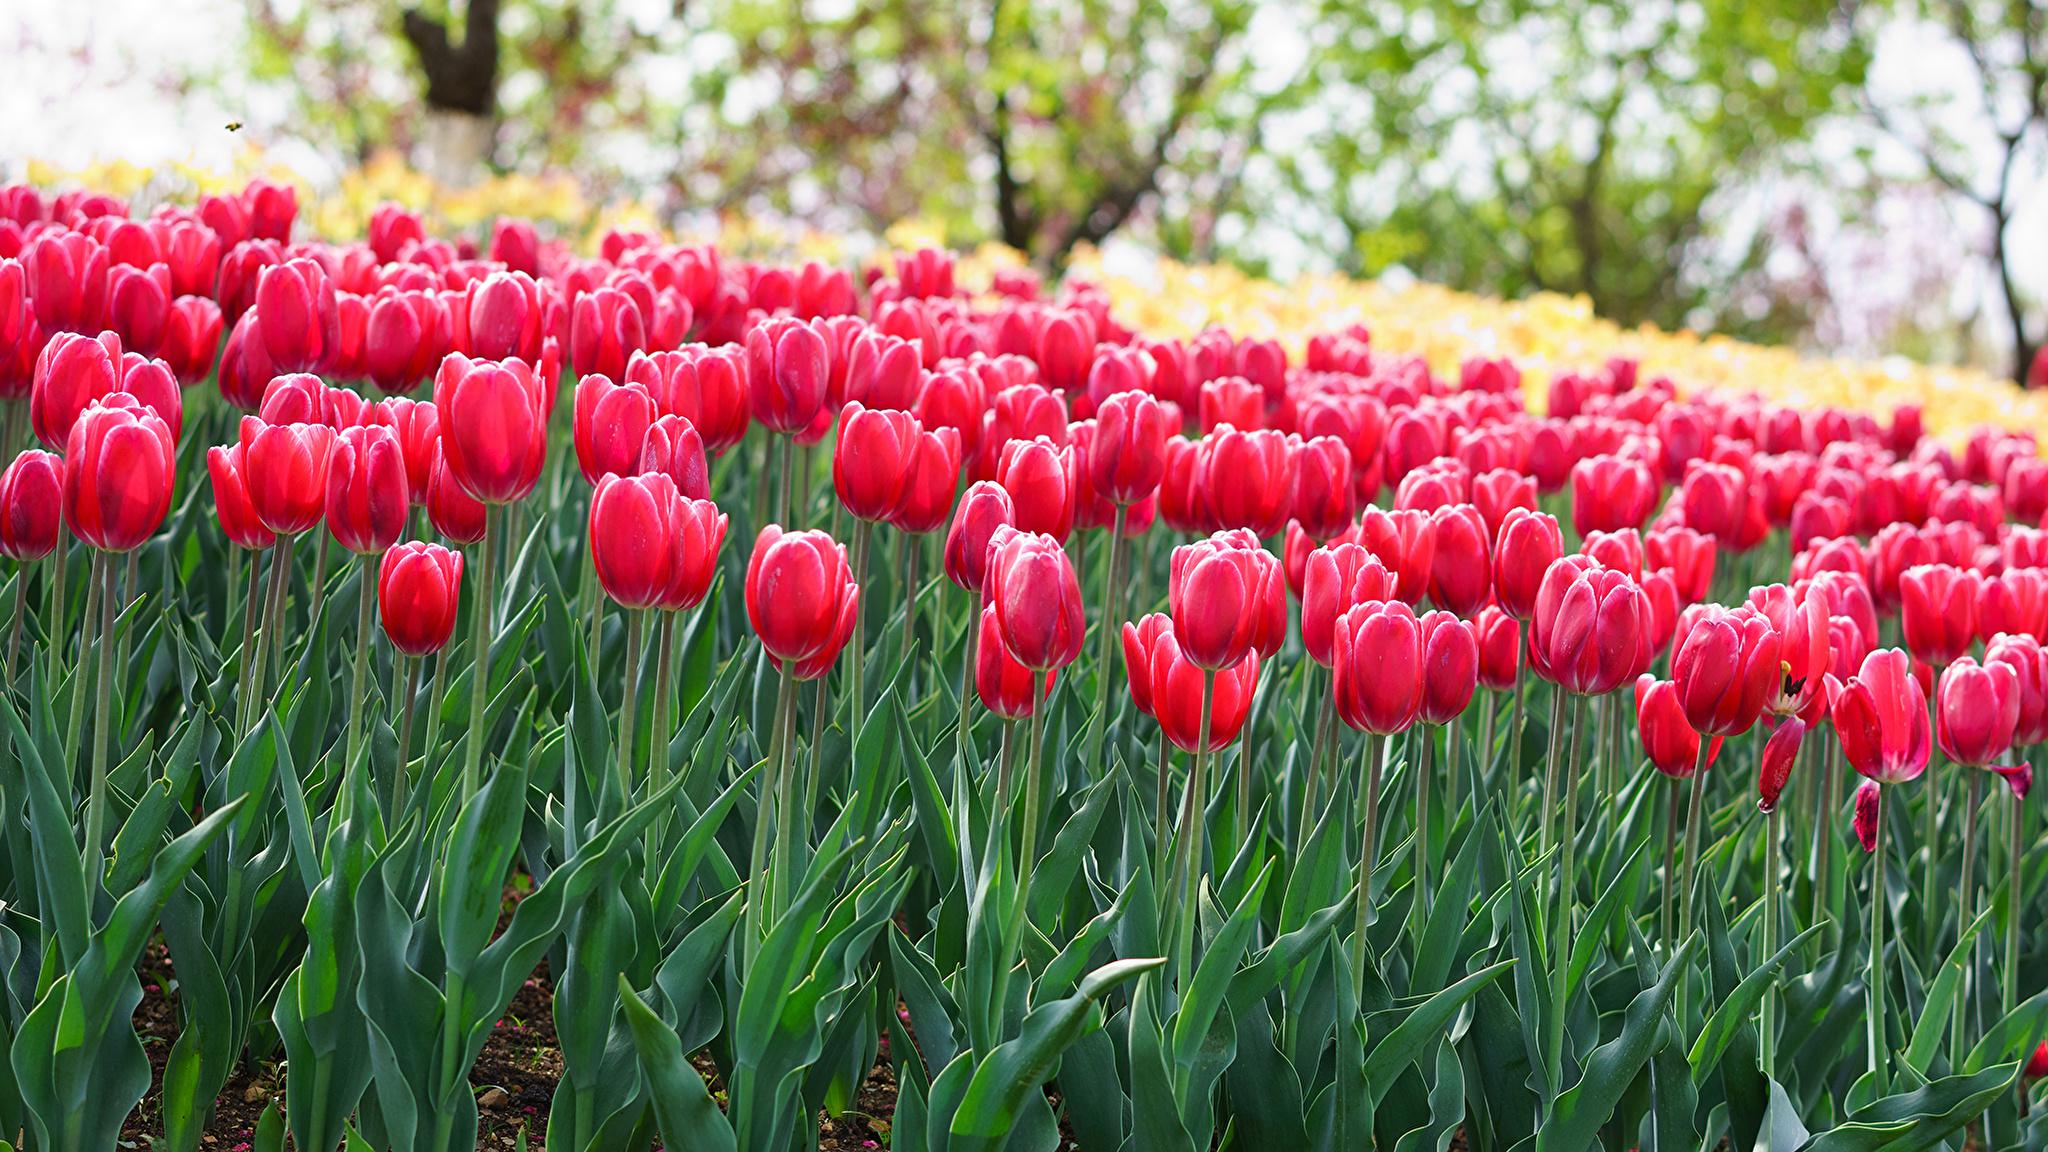 тюльпаны клумба  № 1349316 бесплатно